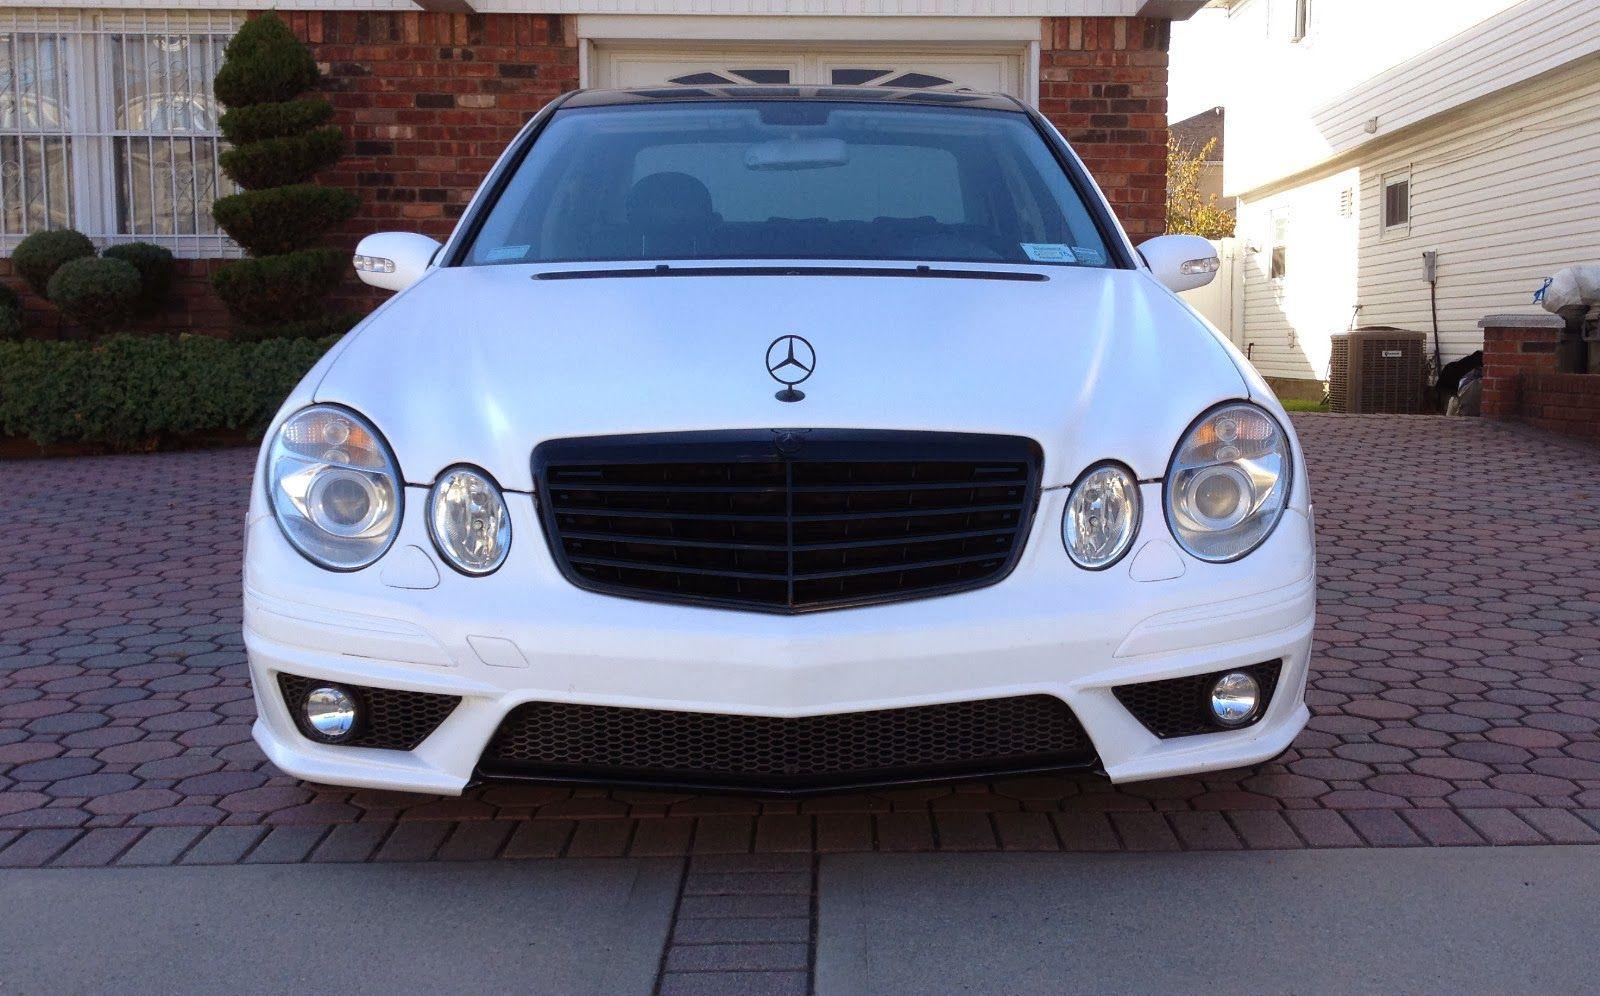 All Types 2003 benz e320 : Mercedes-Benz E320 (W211) - E63 AMG LOOK - #mbhess #mbtuning ...